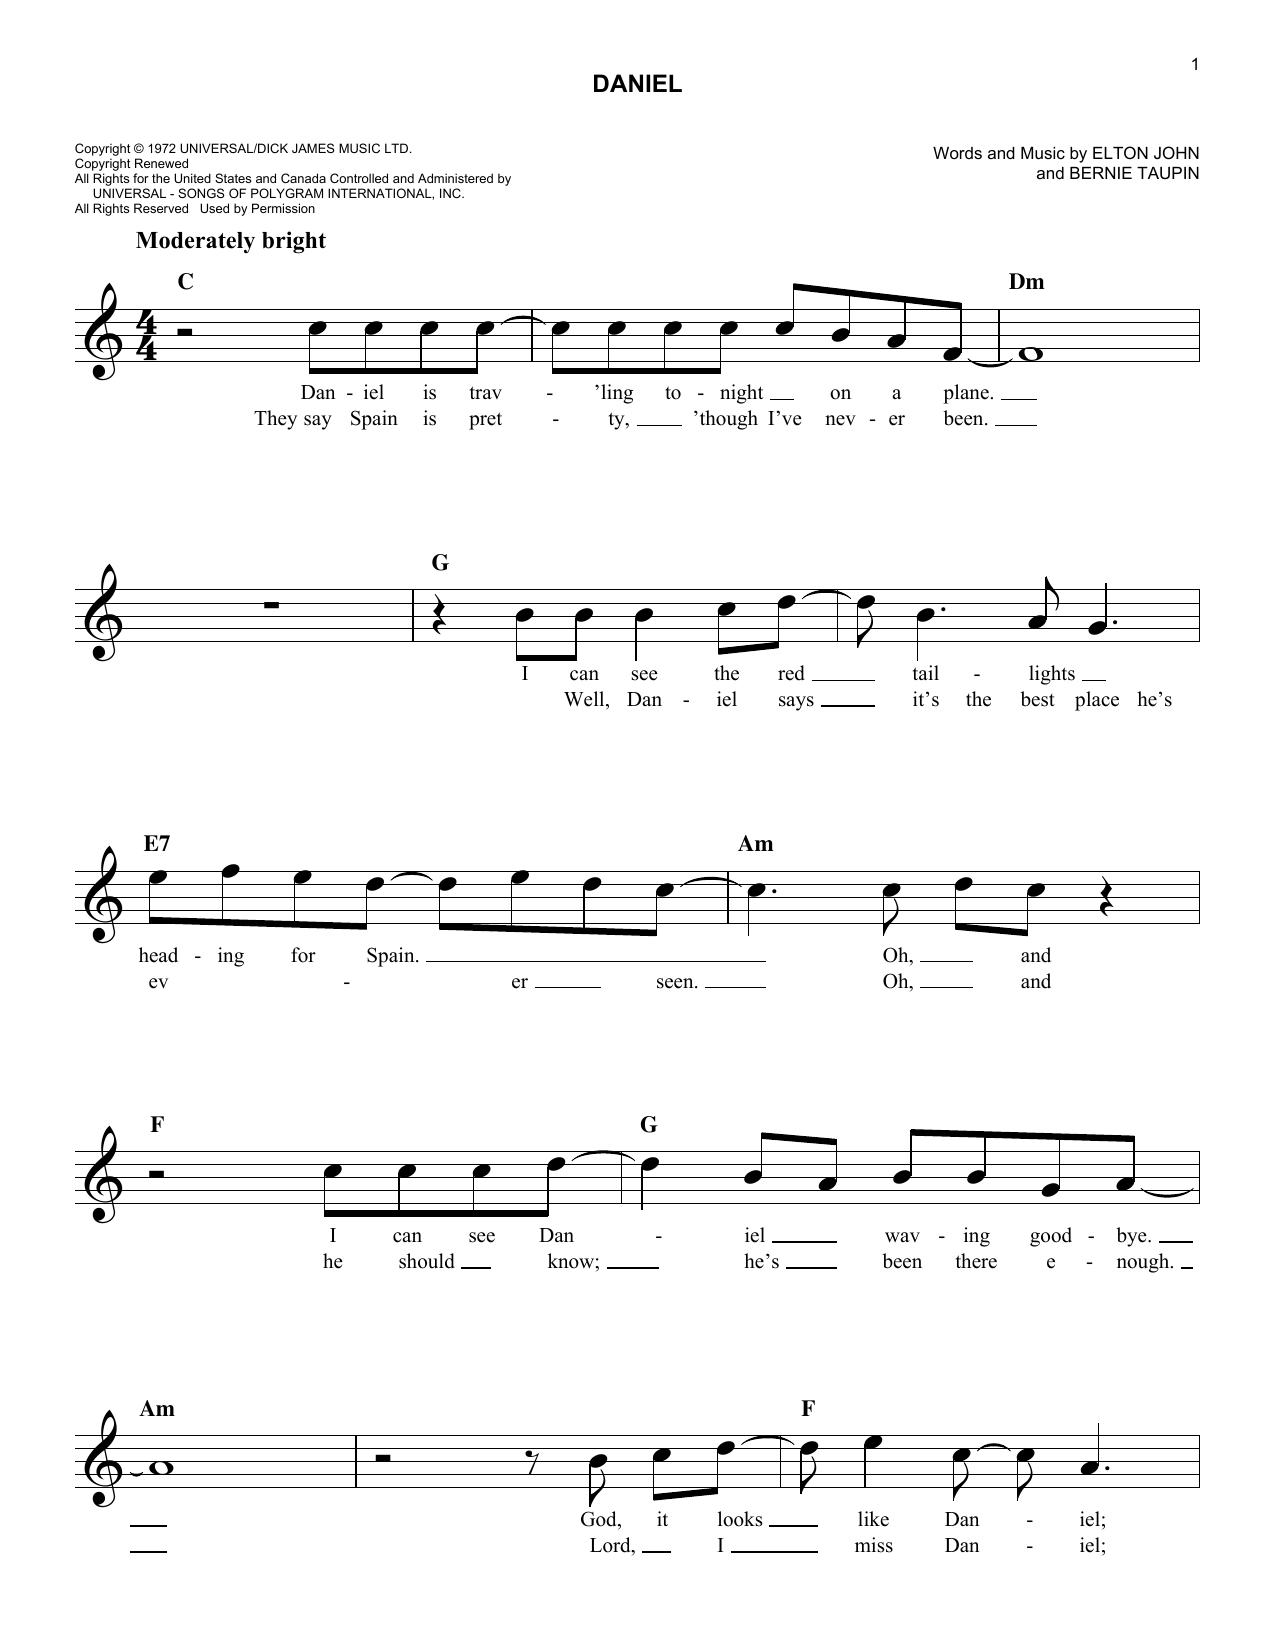 elton john daniel sheet music pdf